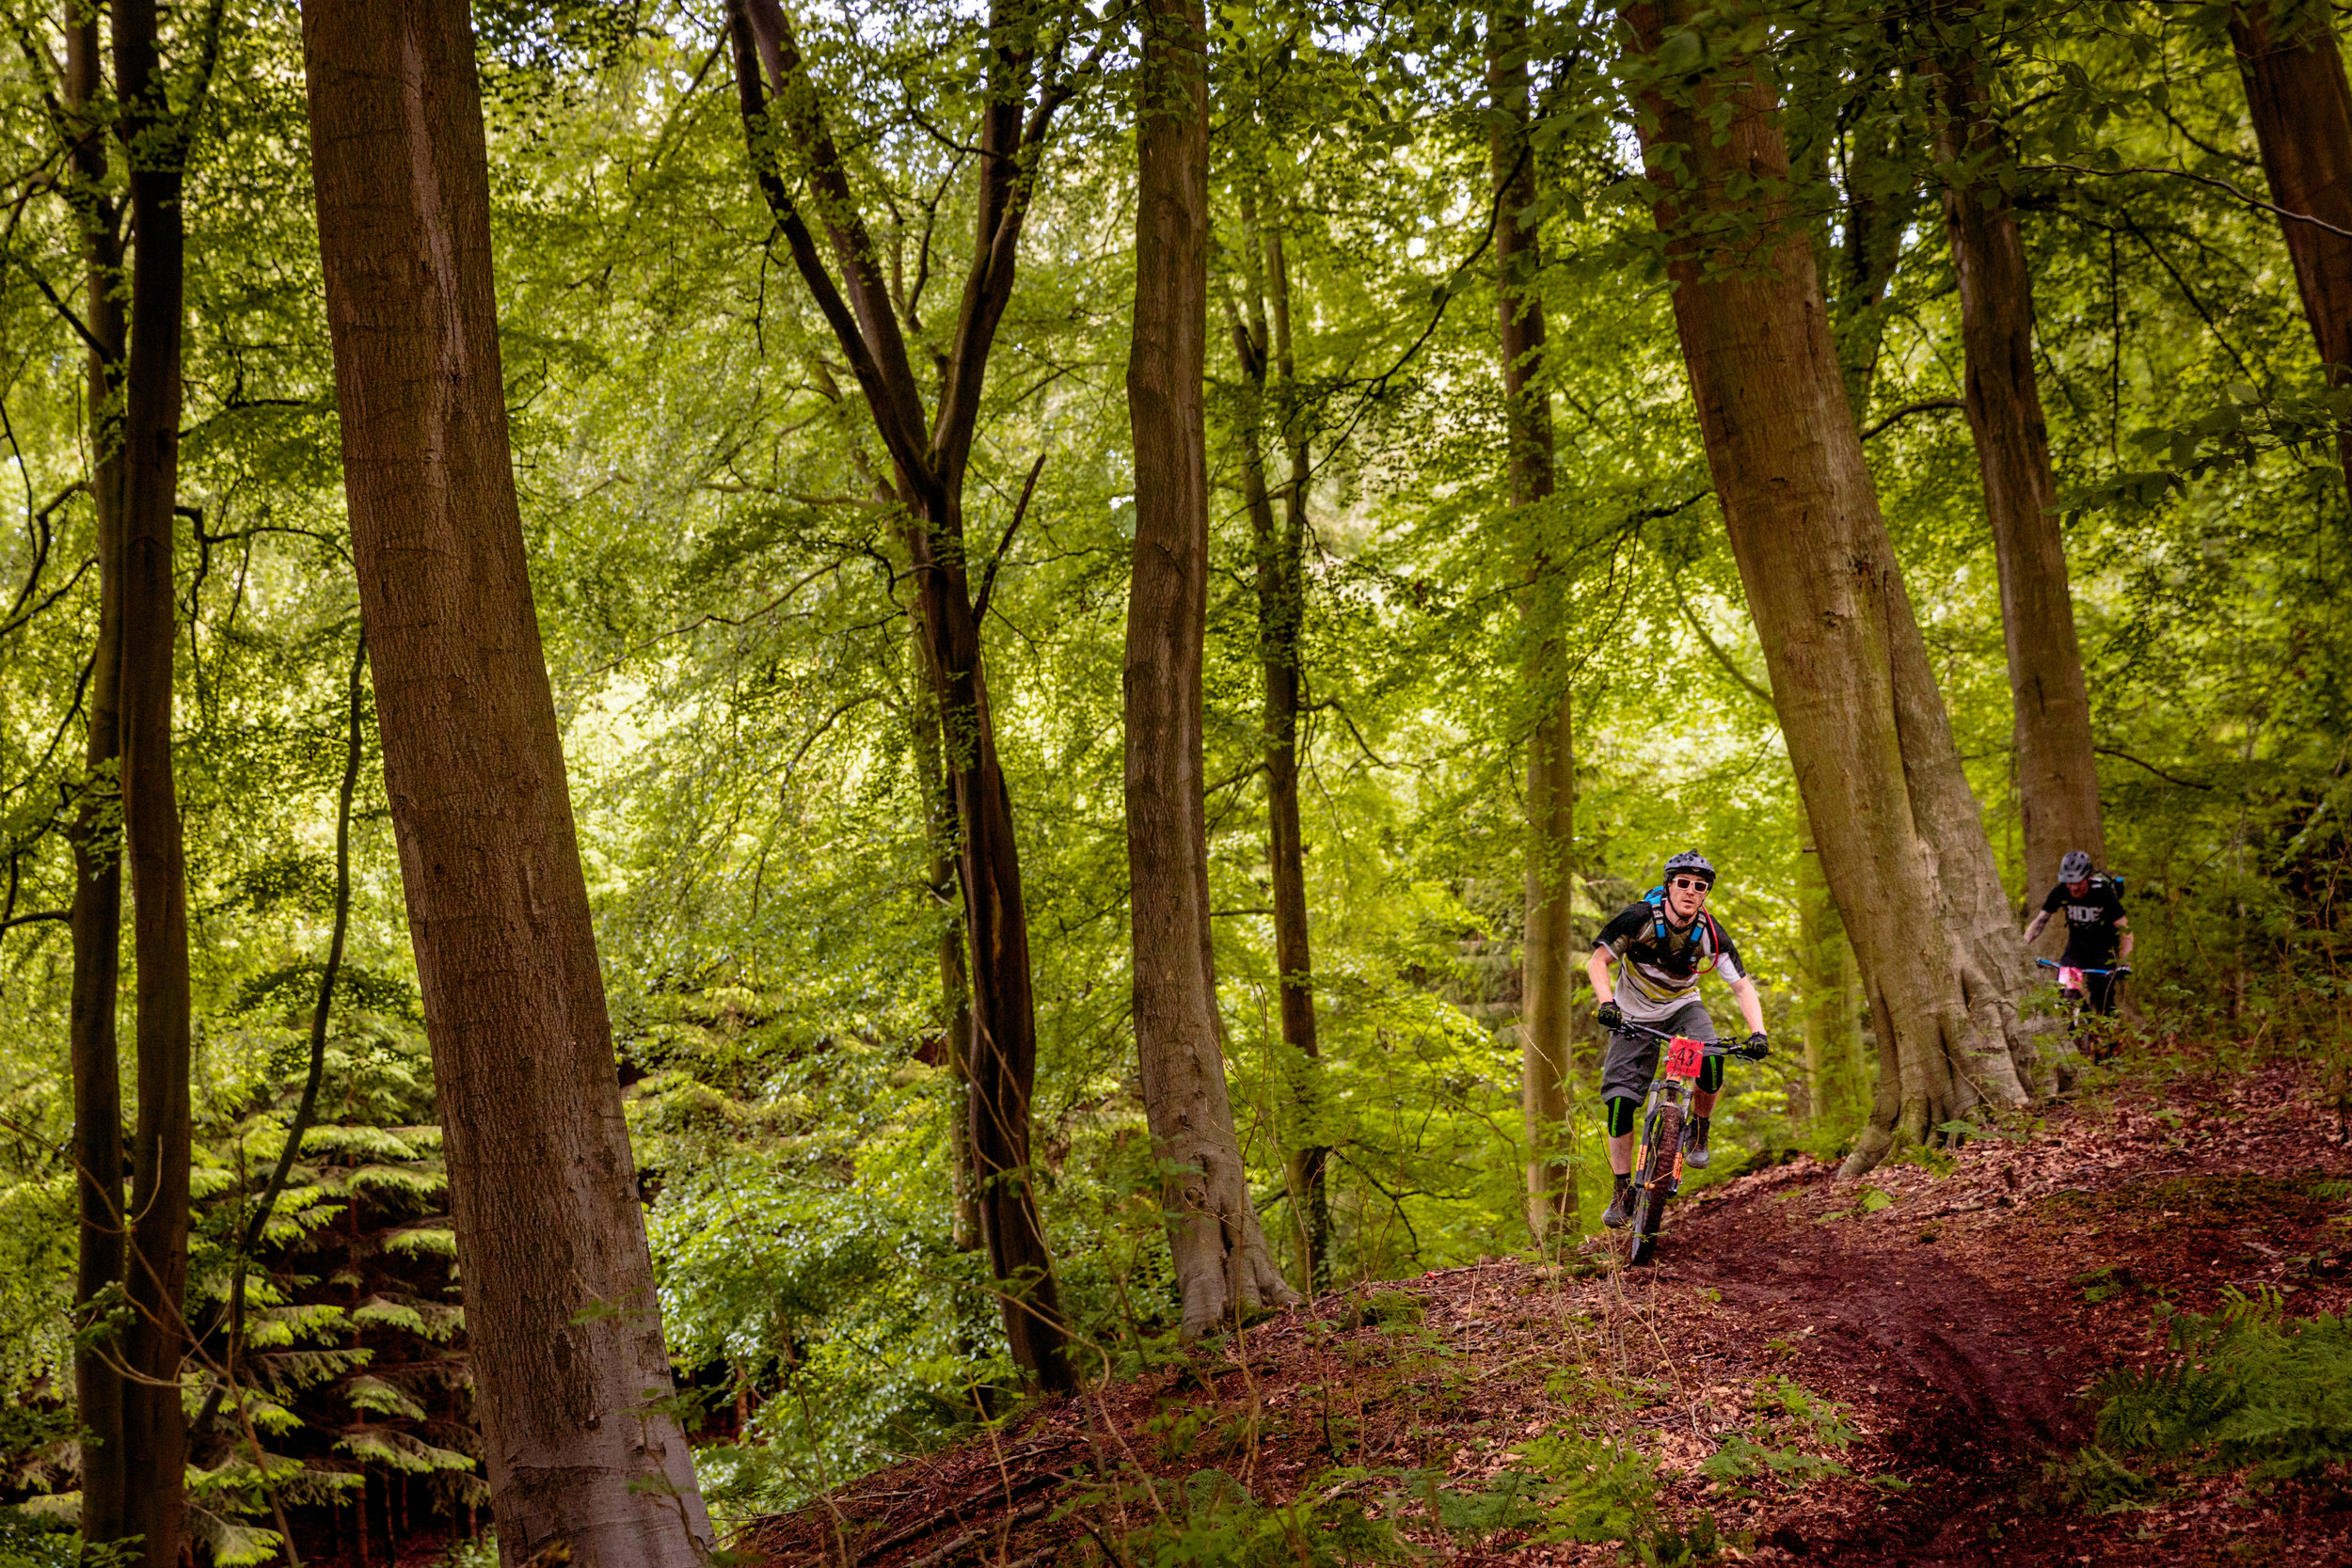 A Mountain Biker in Yorkshire